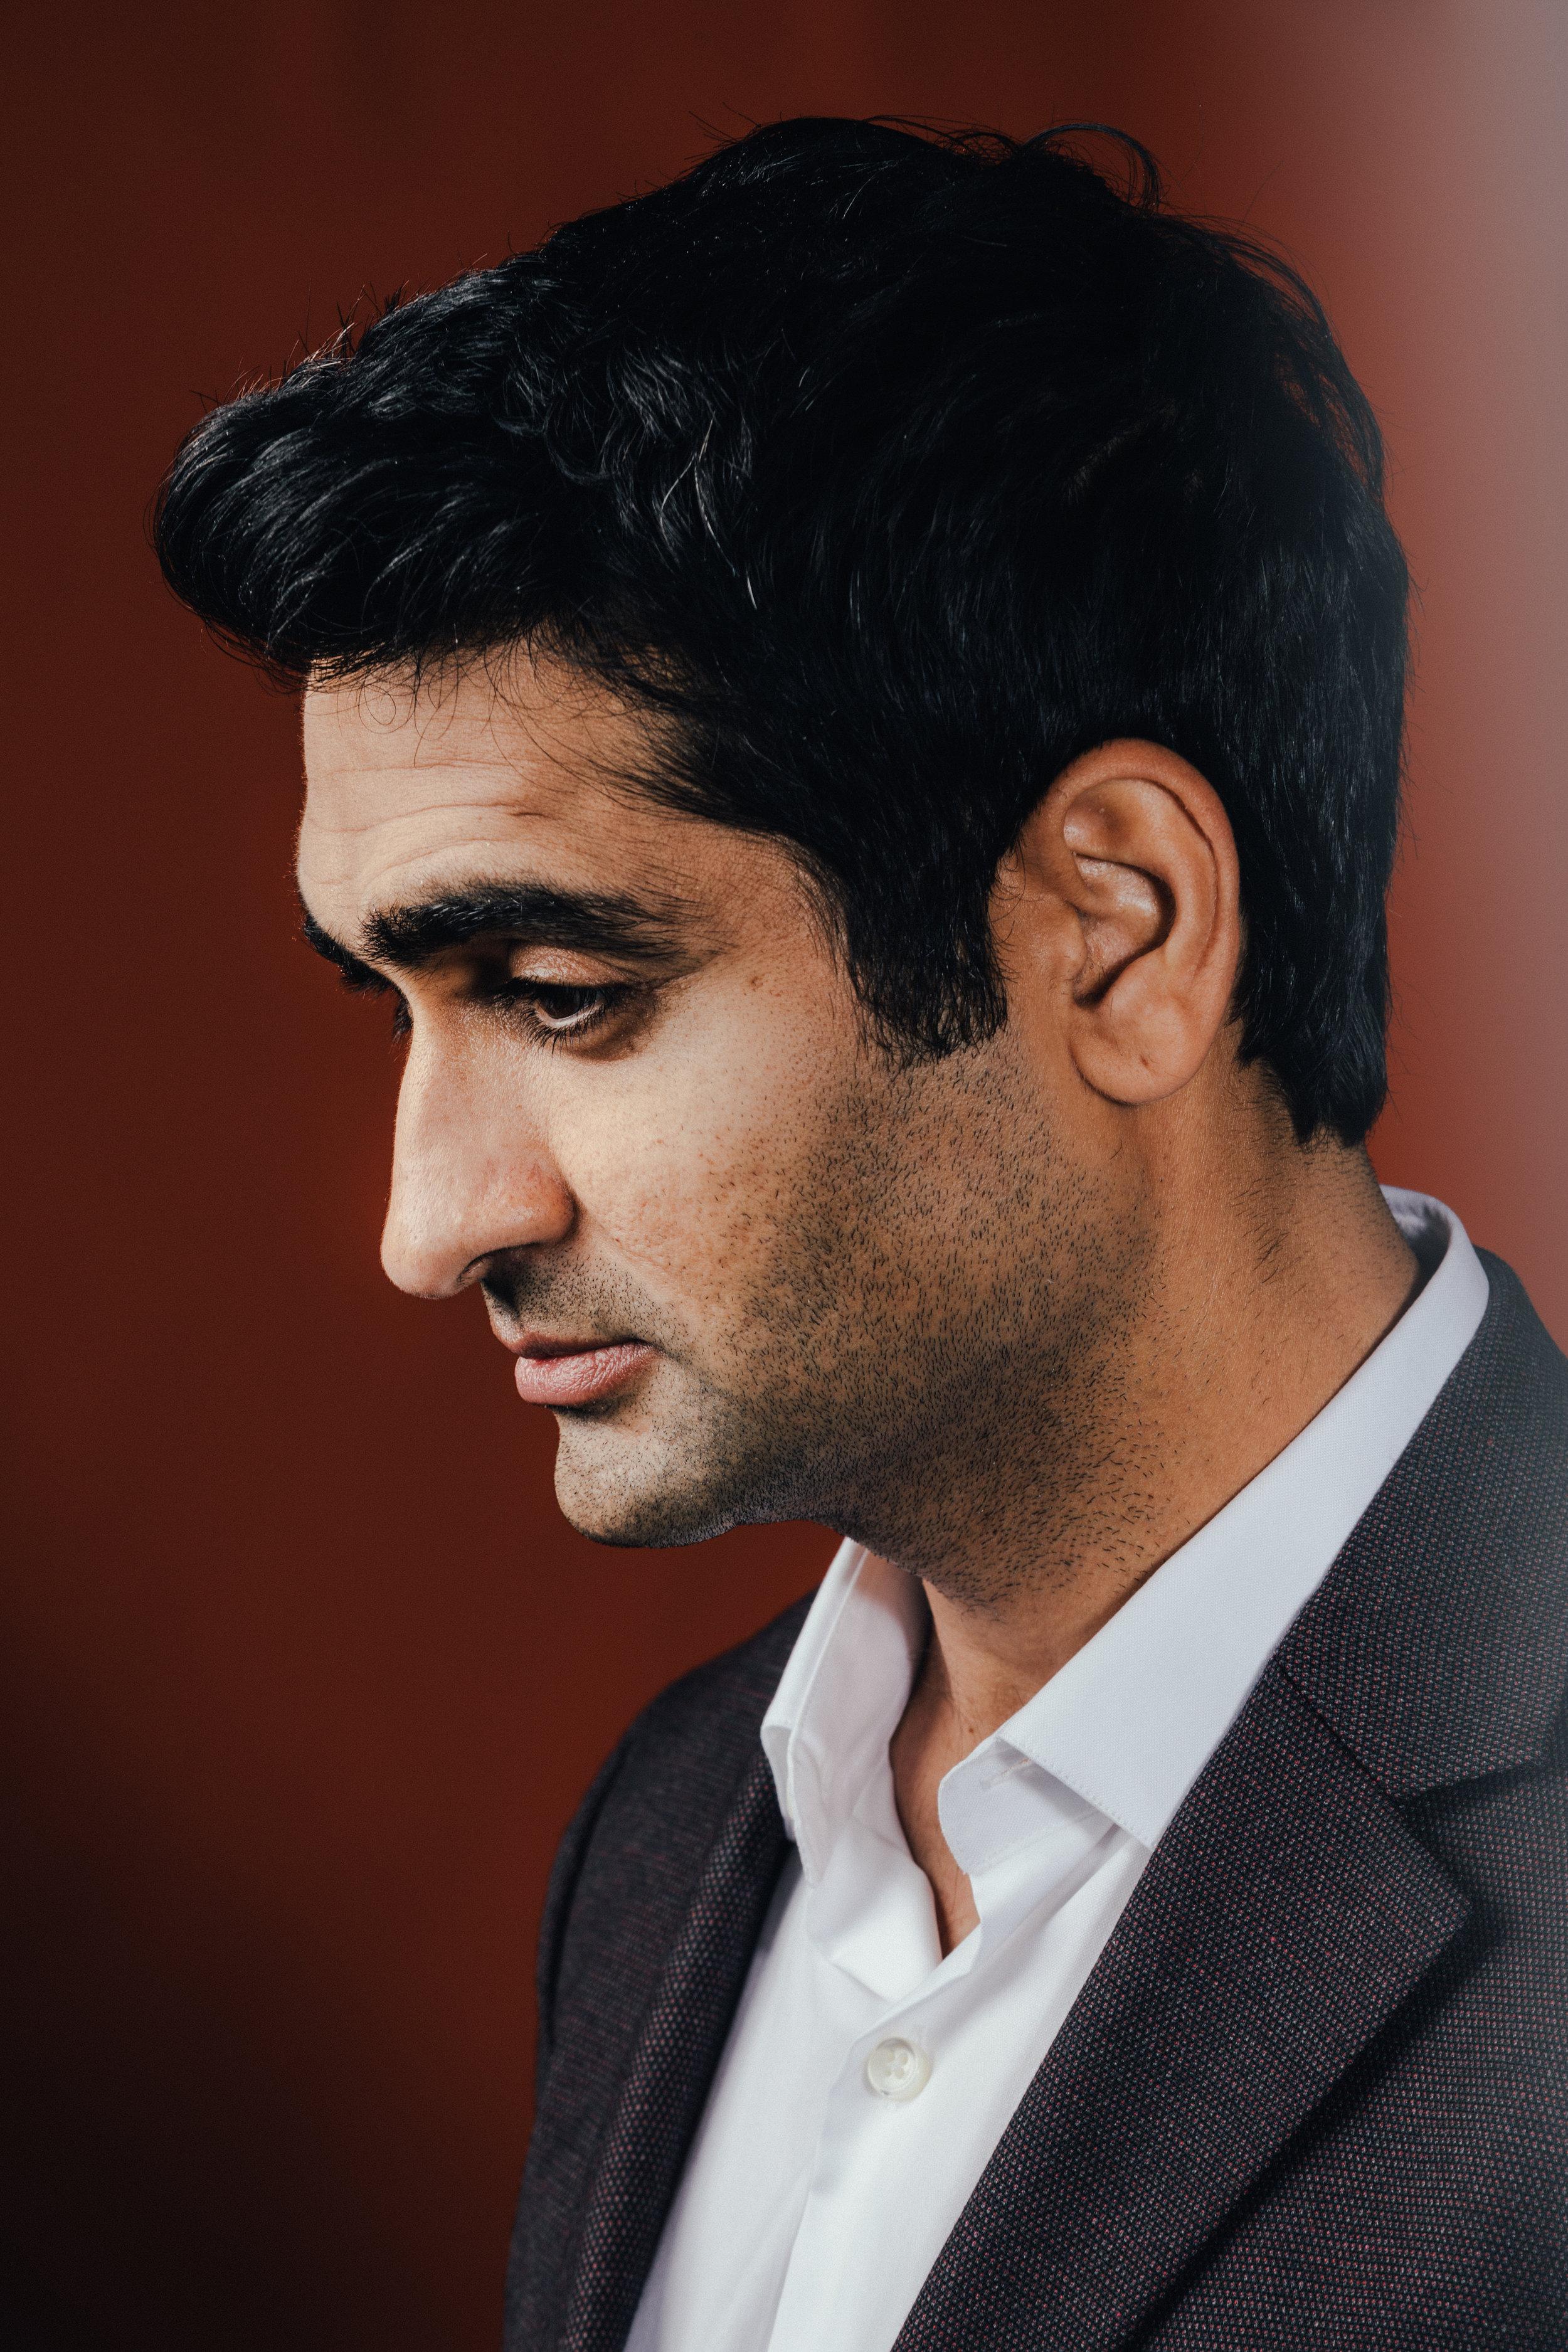 Kumail Nanjiani for The New York Times